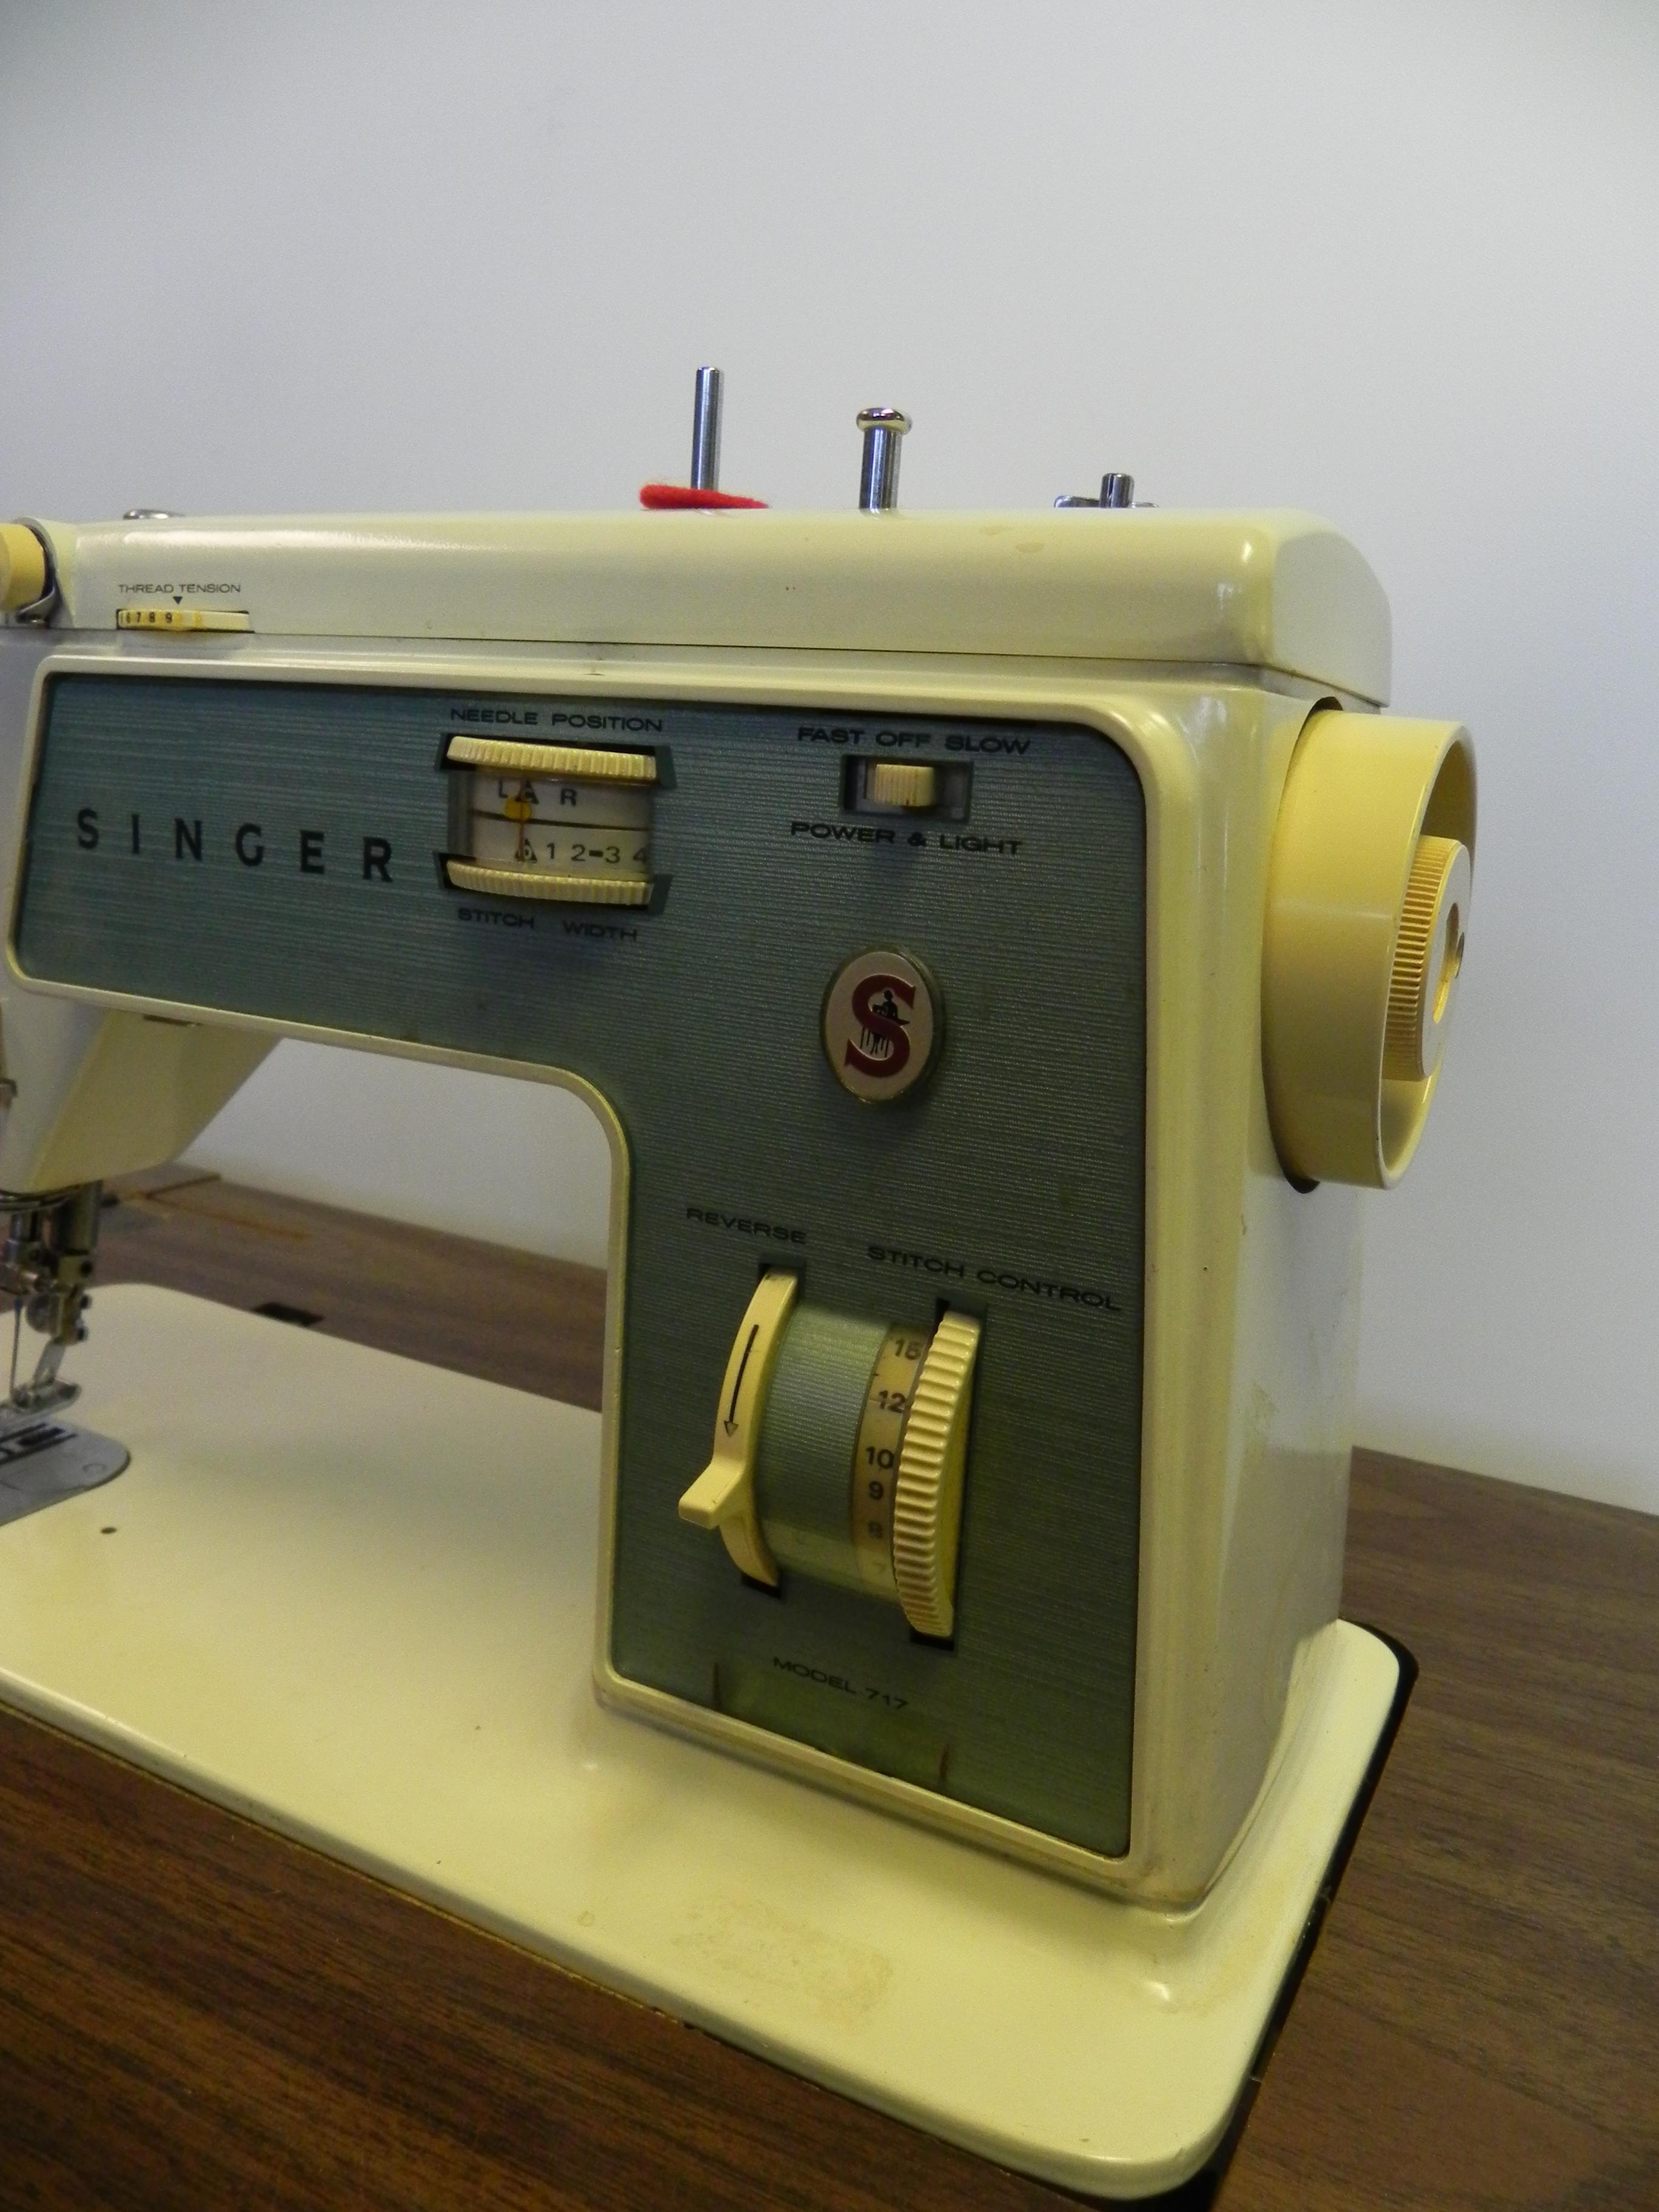 singer sewing machine model 717